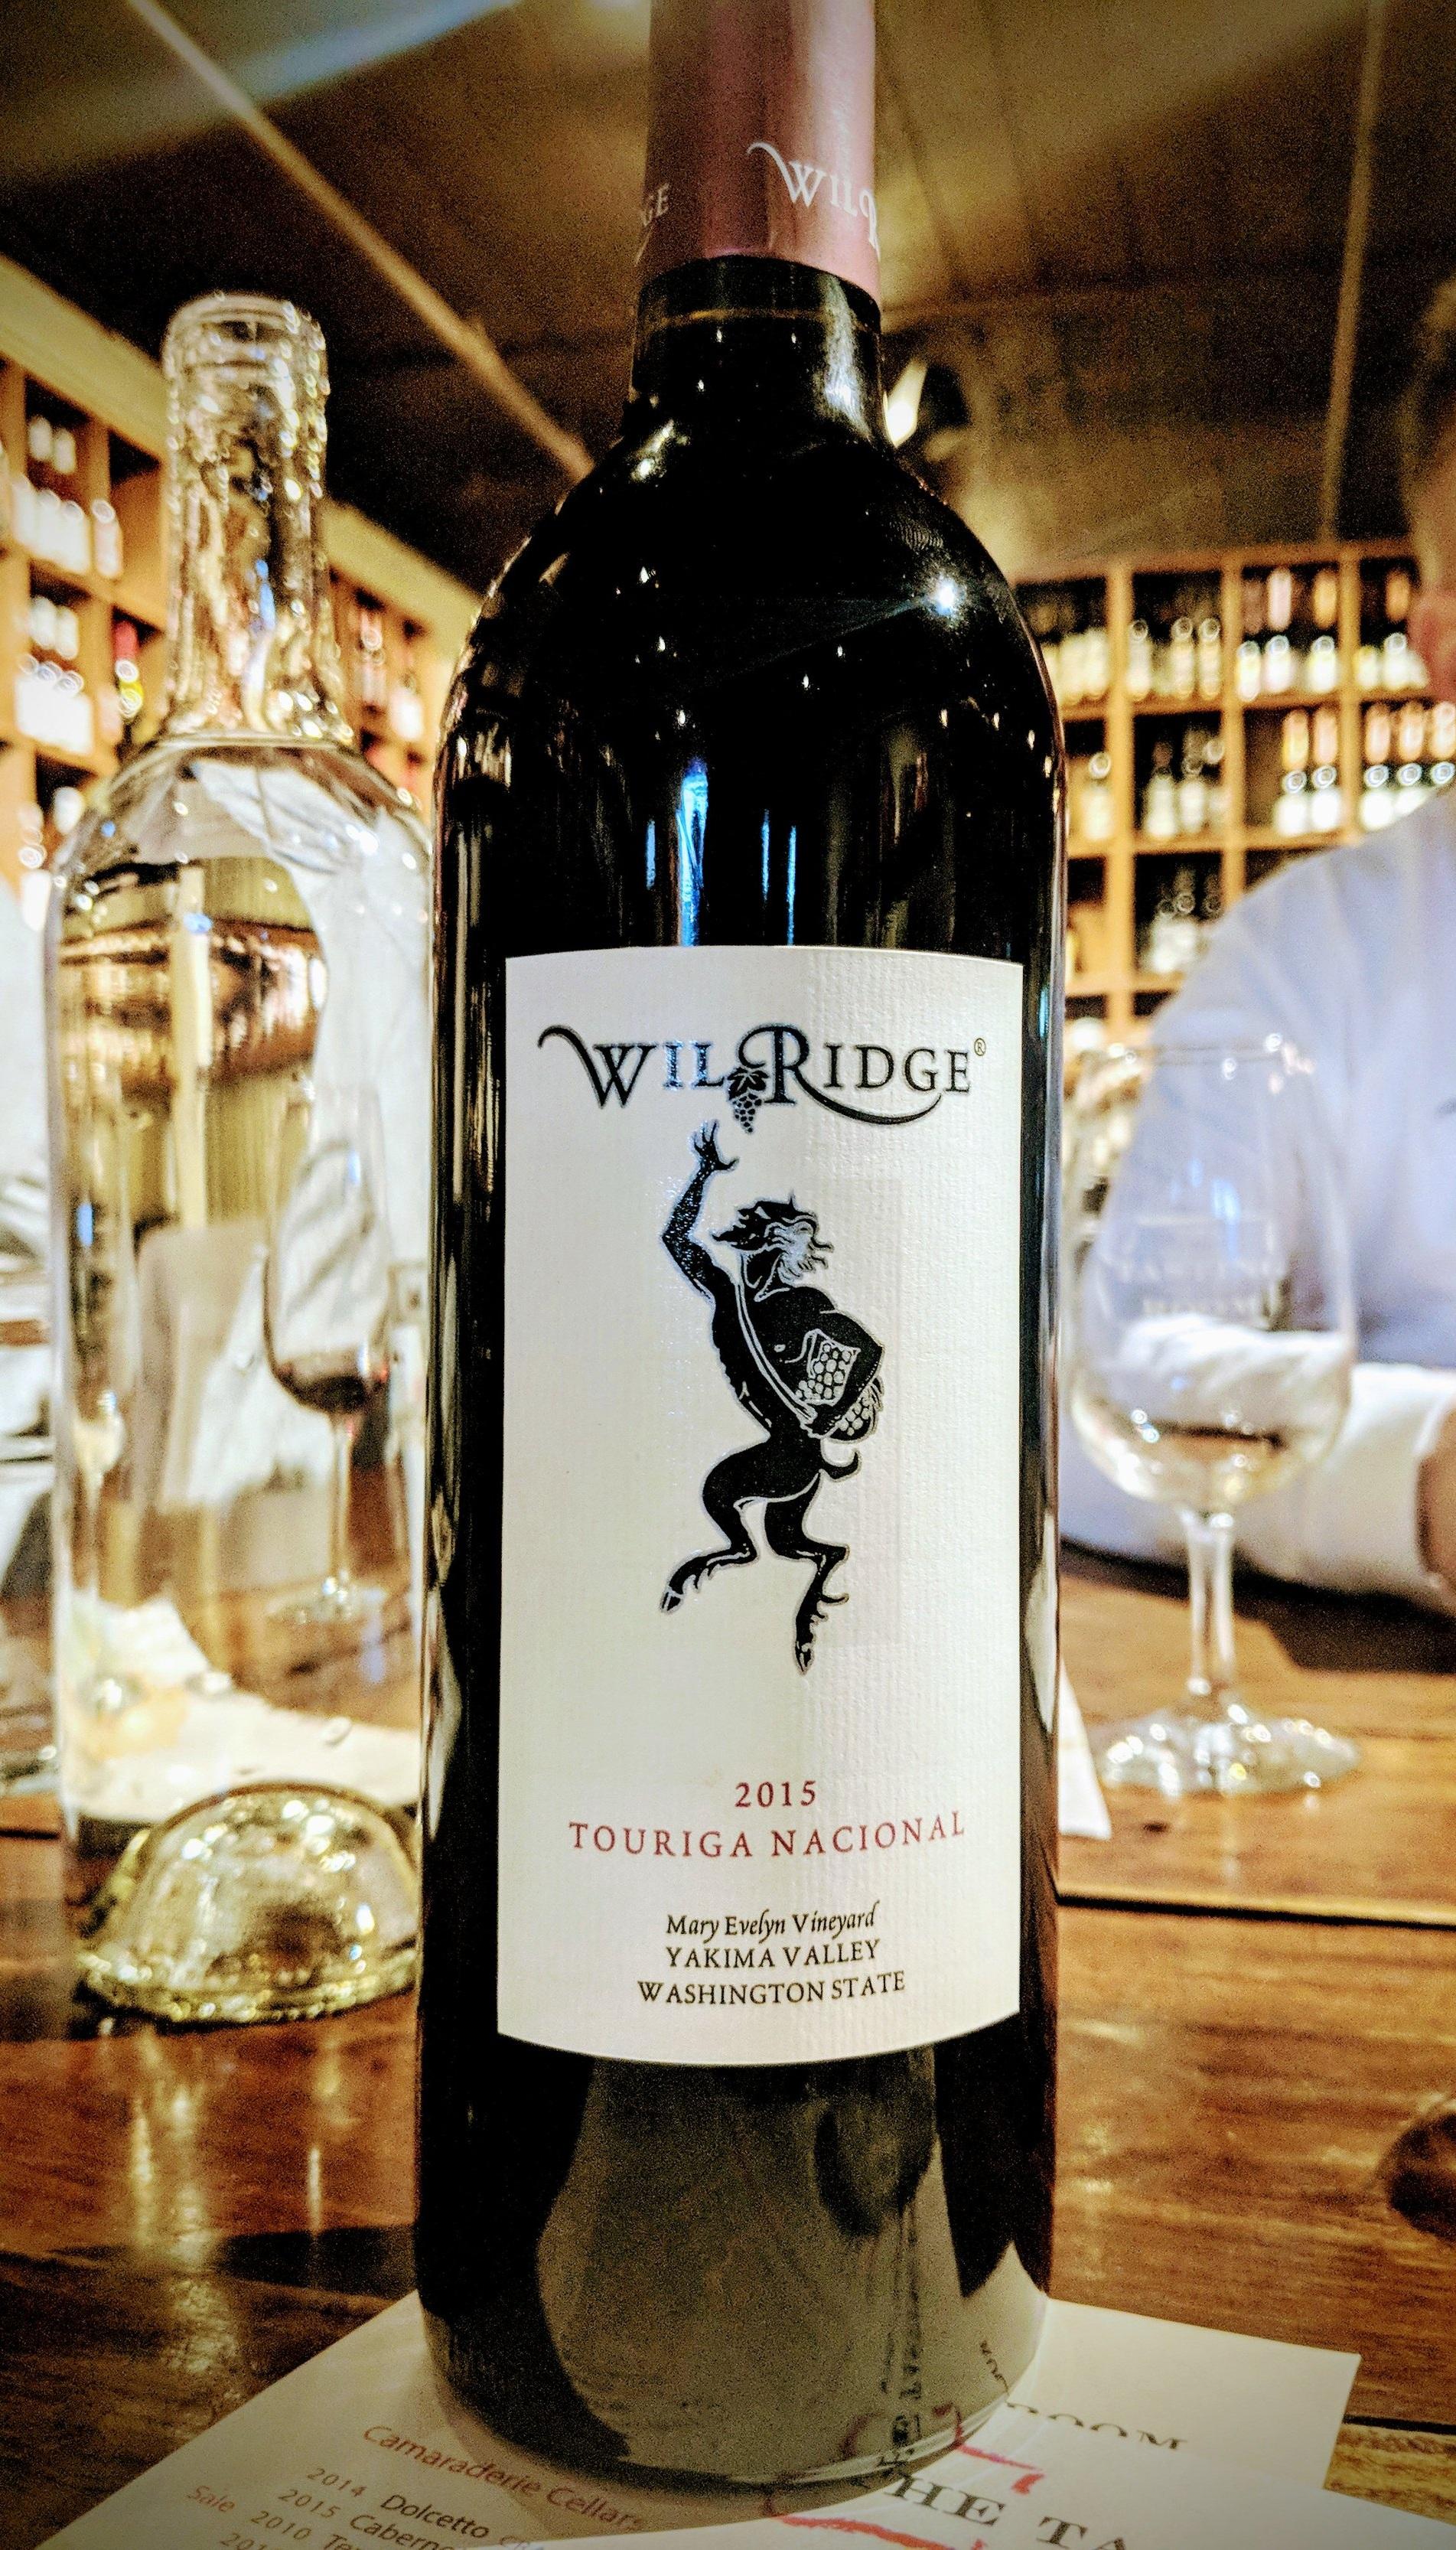 Wilridge Winery grown in the Yakima Valley